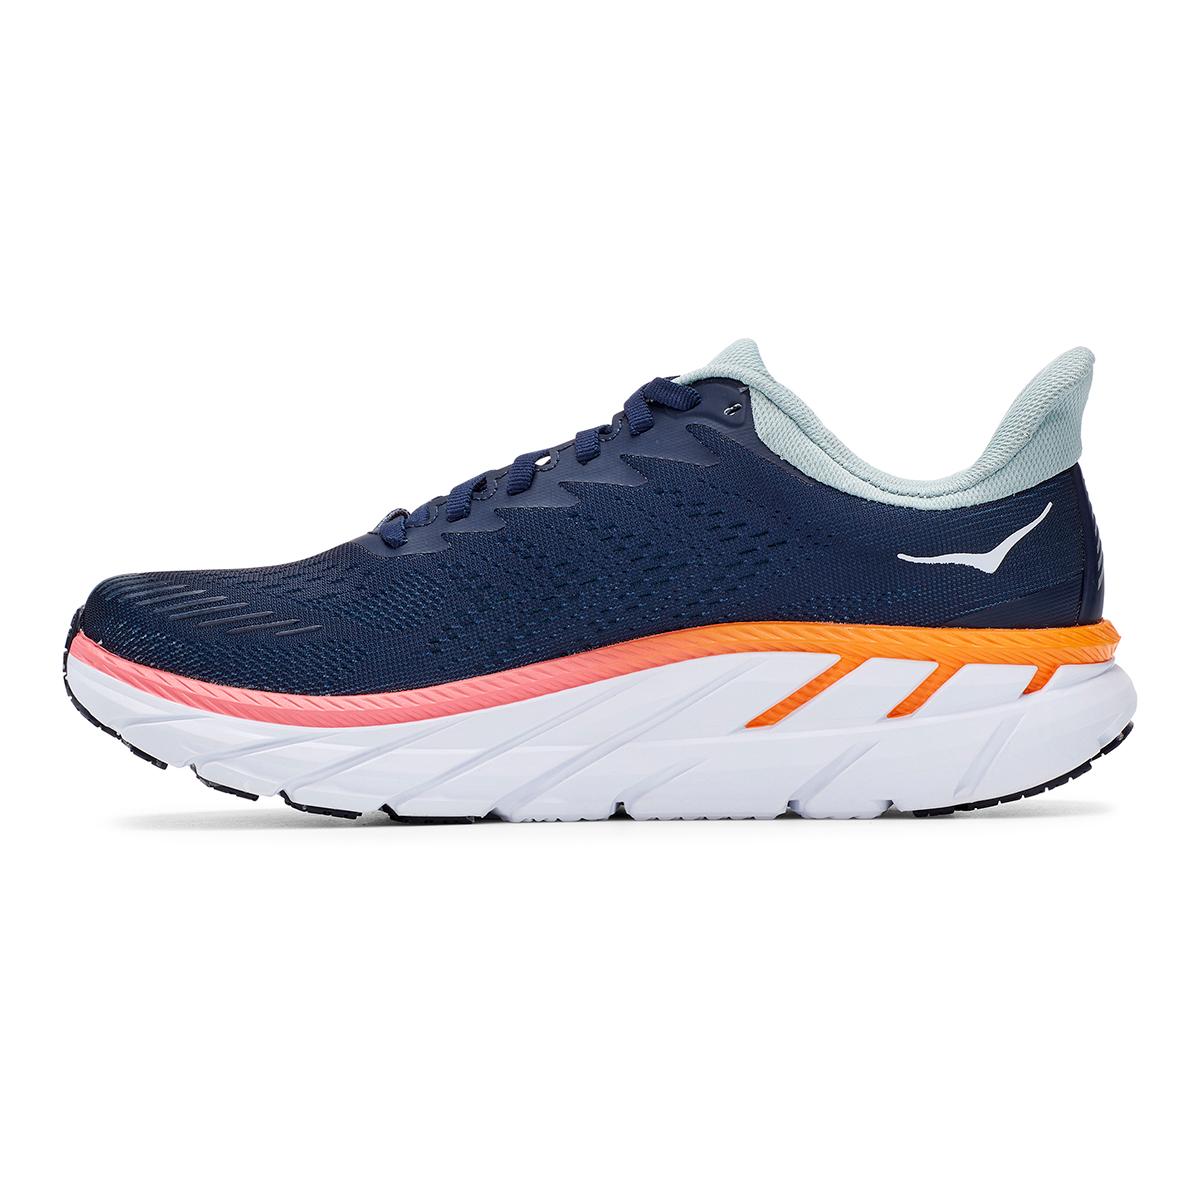 Women's Hoka One One Clifton 7 Running Shoe - Color: Black Iris/Blue Haze - Size: 6 - Width: Regular, Black Iris/Blue Haze, large, image 6